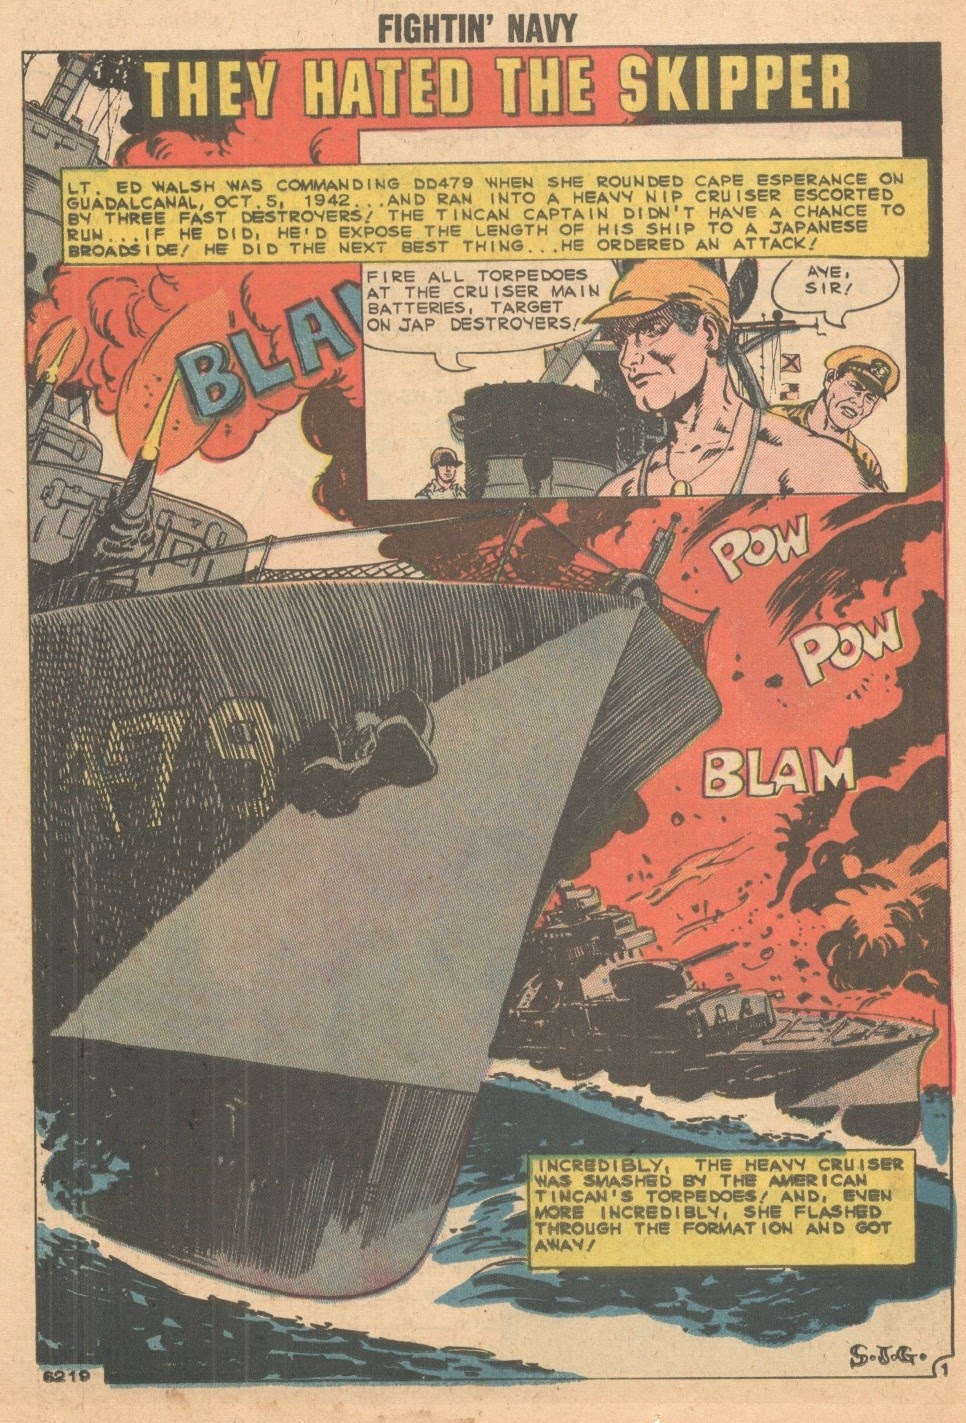 Read online Fightin' Navy comic -  Issue #93 - 26